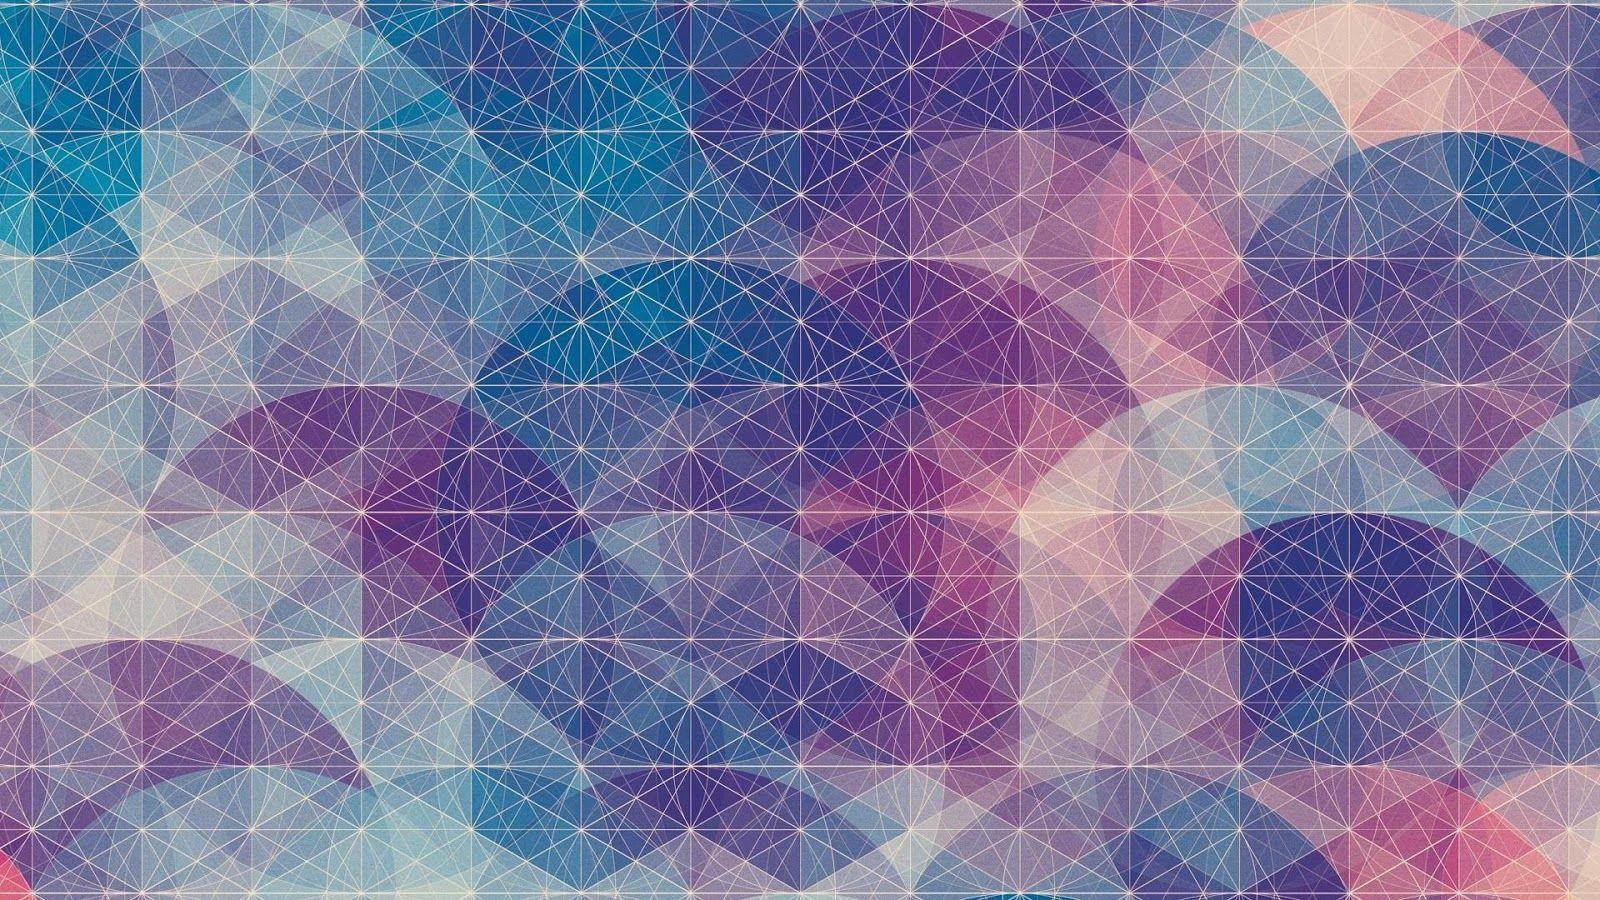 Geometric Shape Design HD Desktop Wallpaper 24824